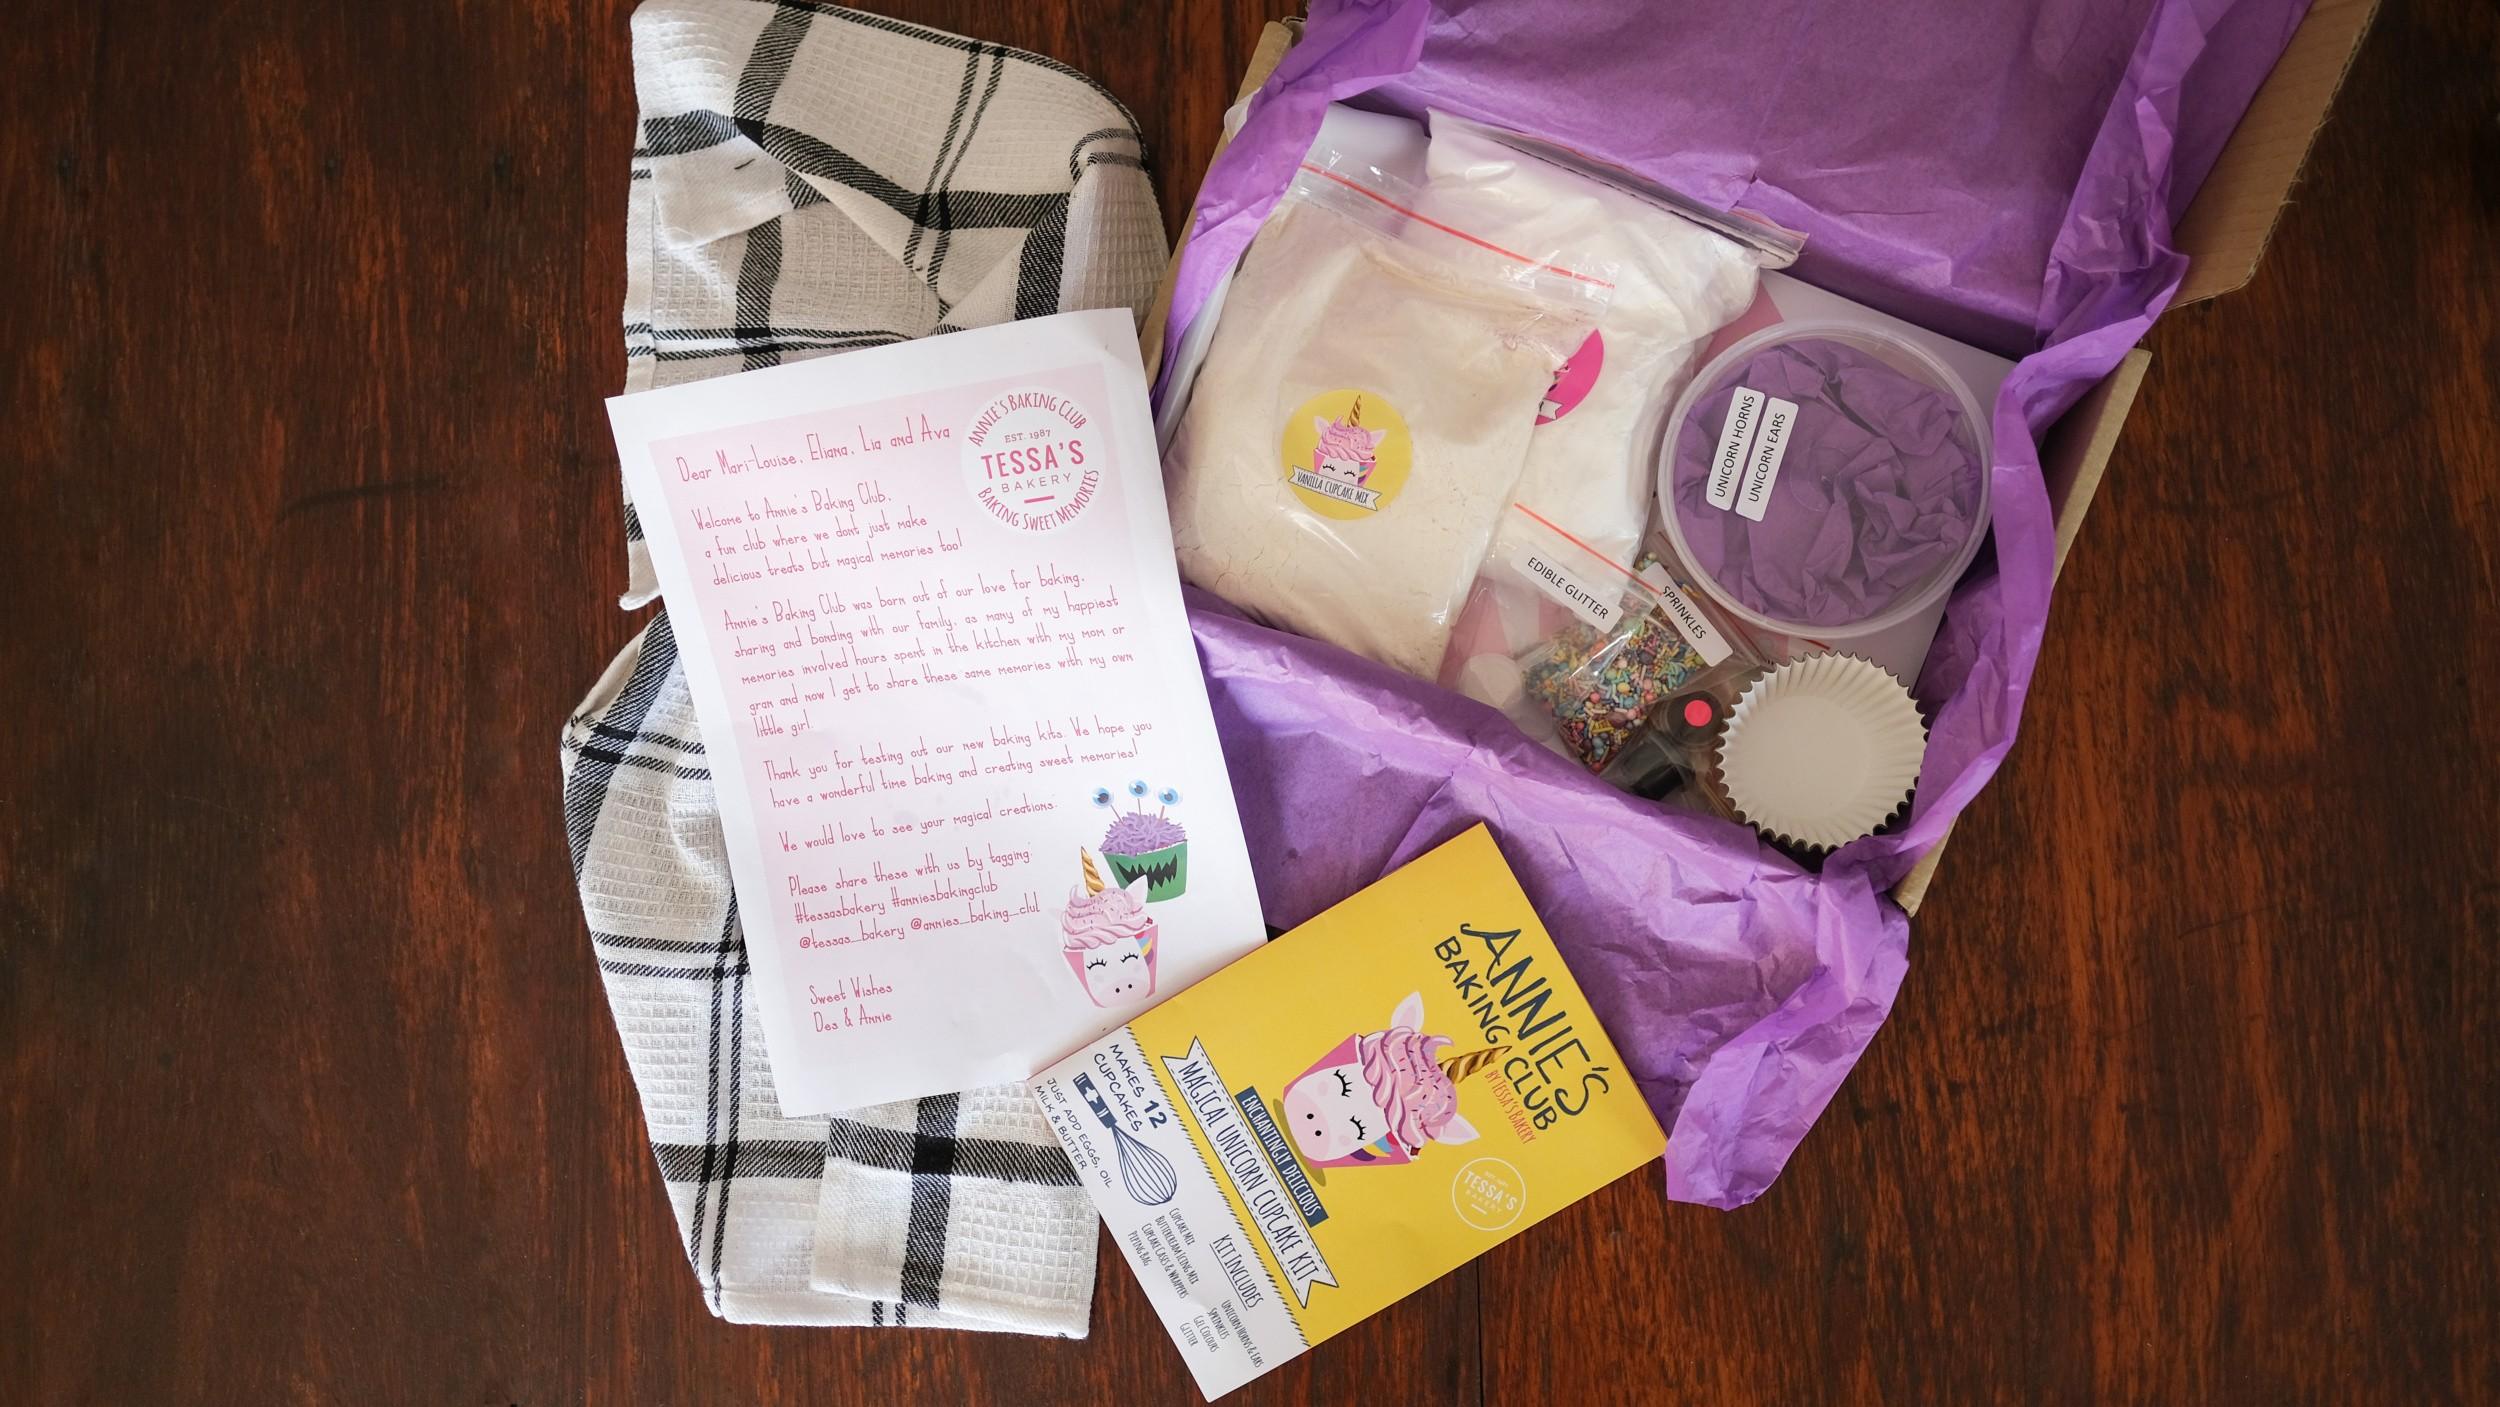 Justamamma Diy Home Baking Kits South Africa